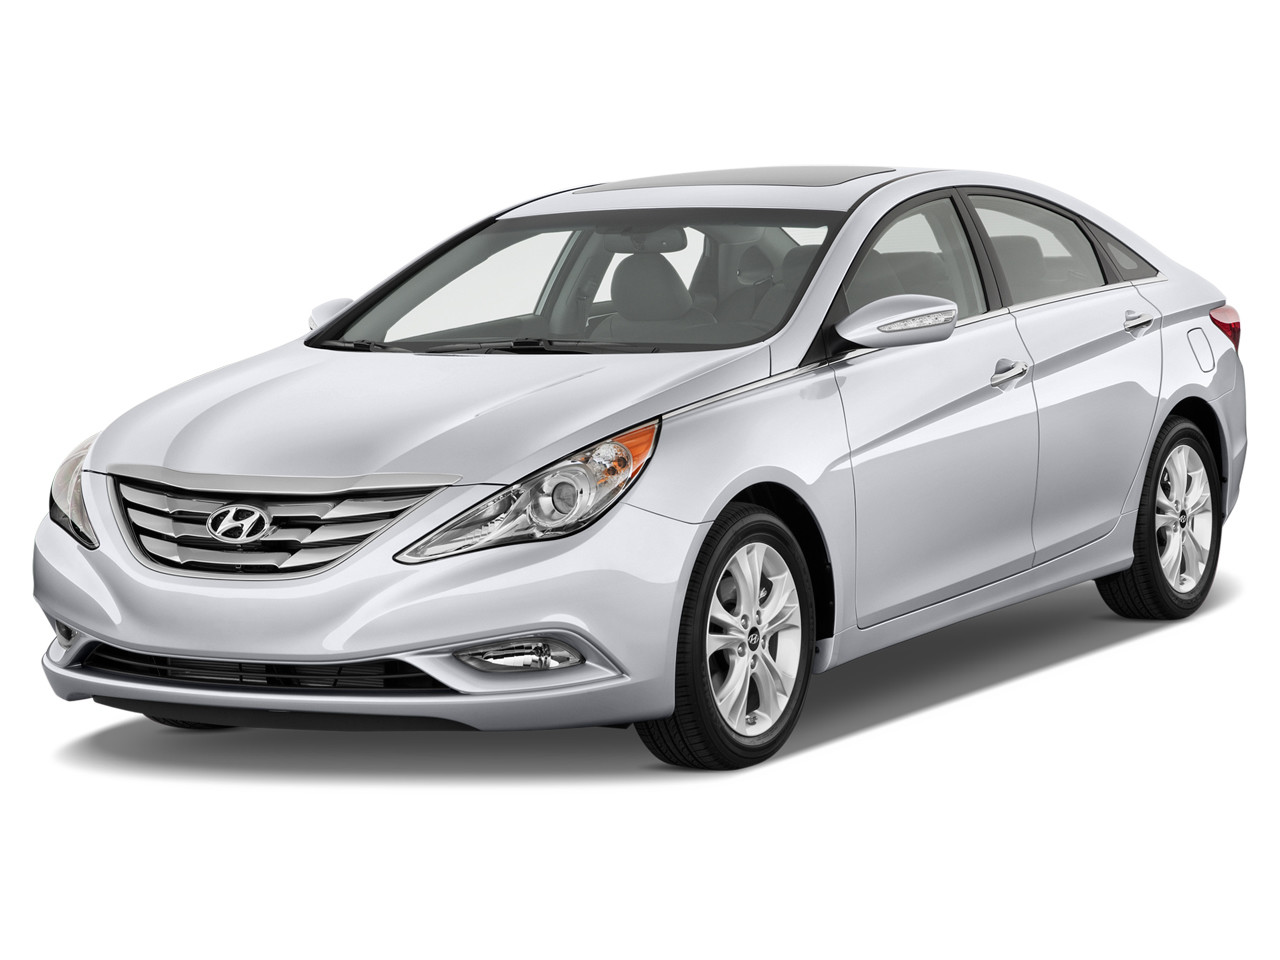 Chiptuning Hyundai Sonata 2.4 161 pk